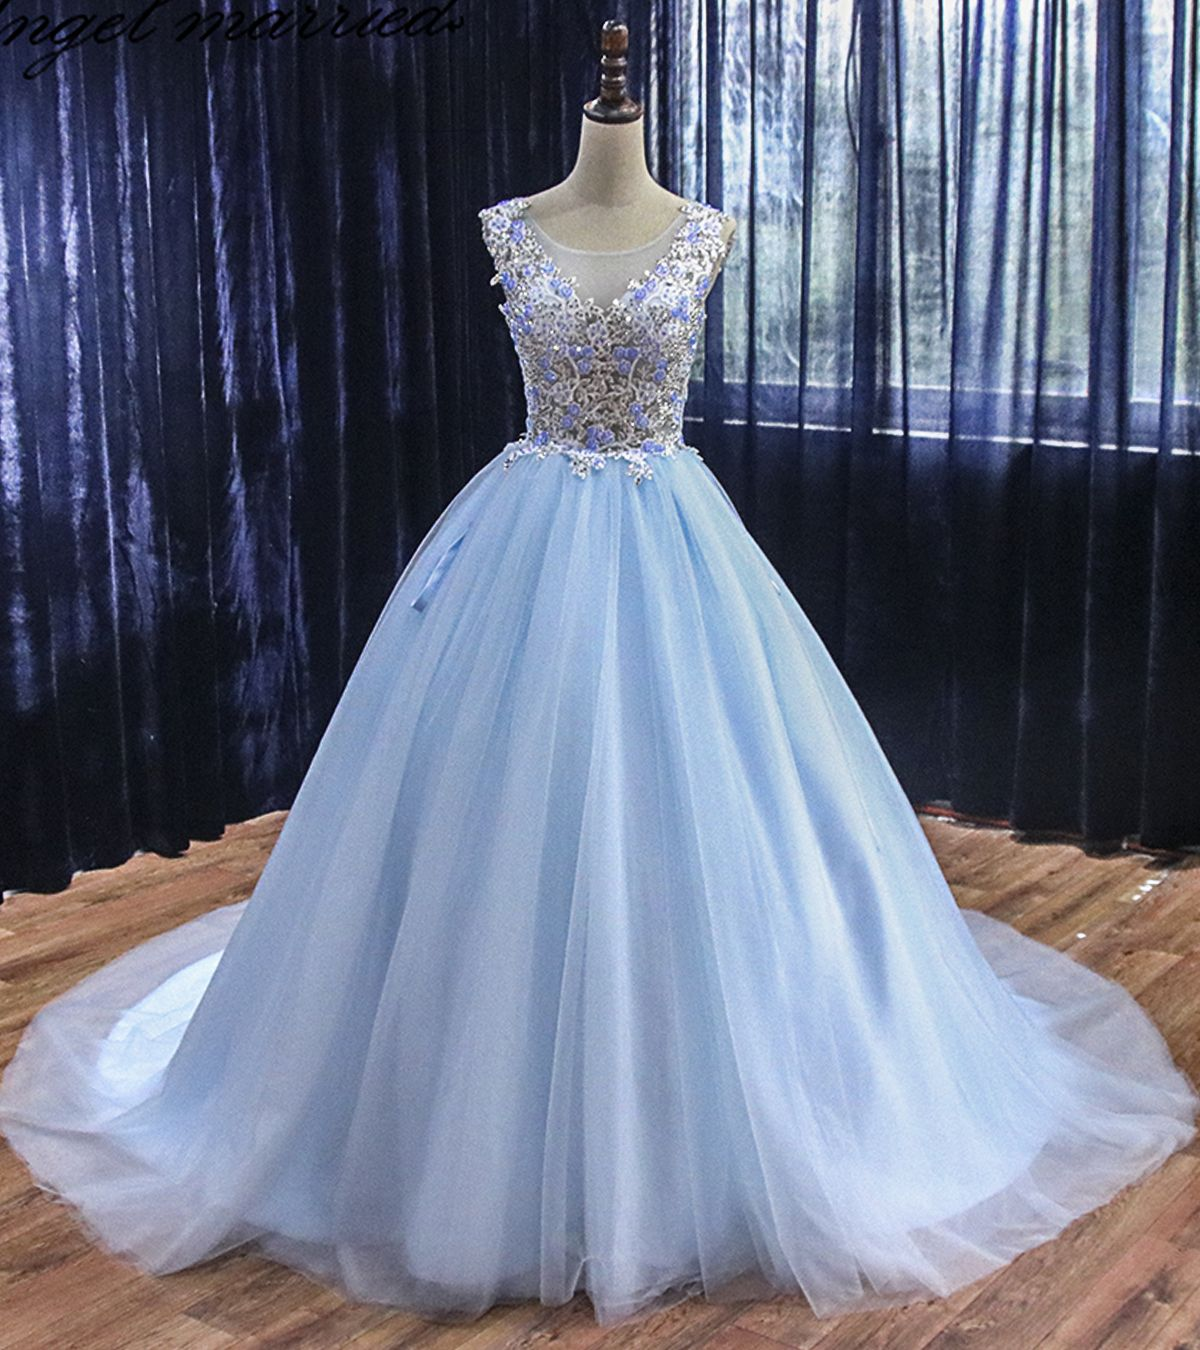 Light Sky Blue Tulle Custom Made Long Sweet 16 Prom Dress Quinceanera Dress Dresses Quinceanera Dresses Recital Dress [ 1350 x 1200 Pixel ]